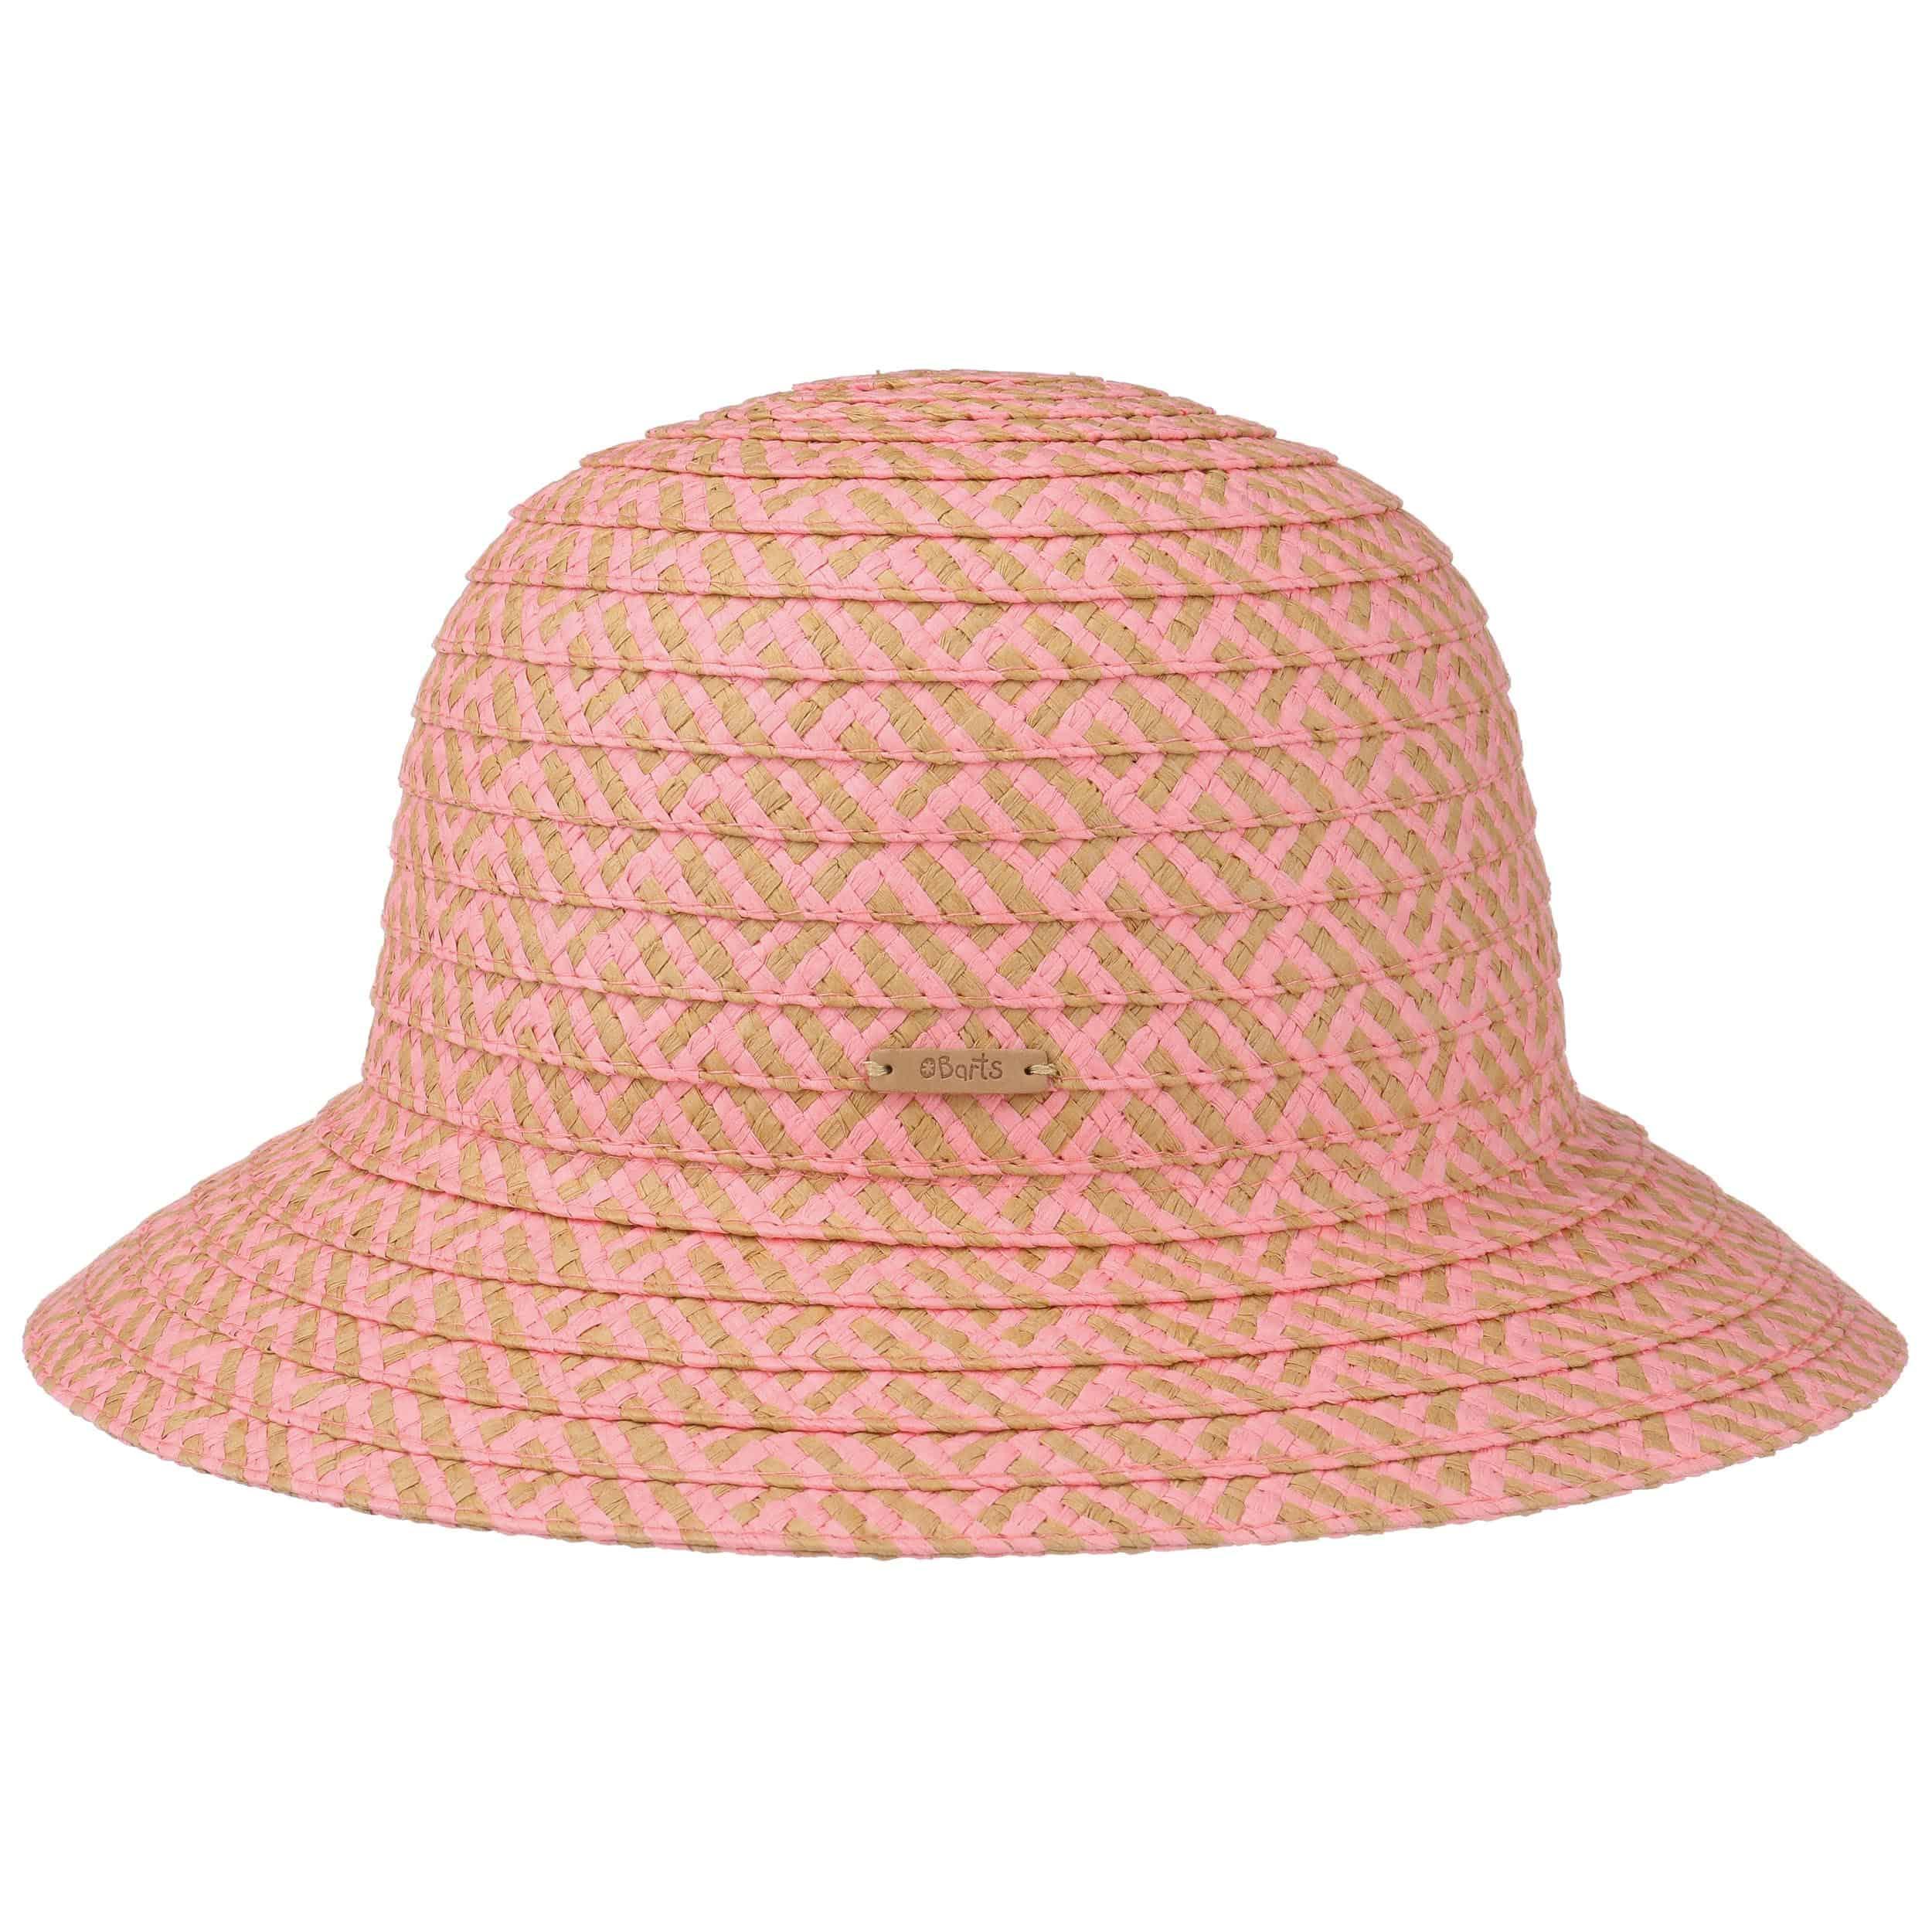 ACCESSORIES - Hats Barts ebgiWYHP